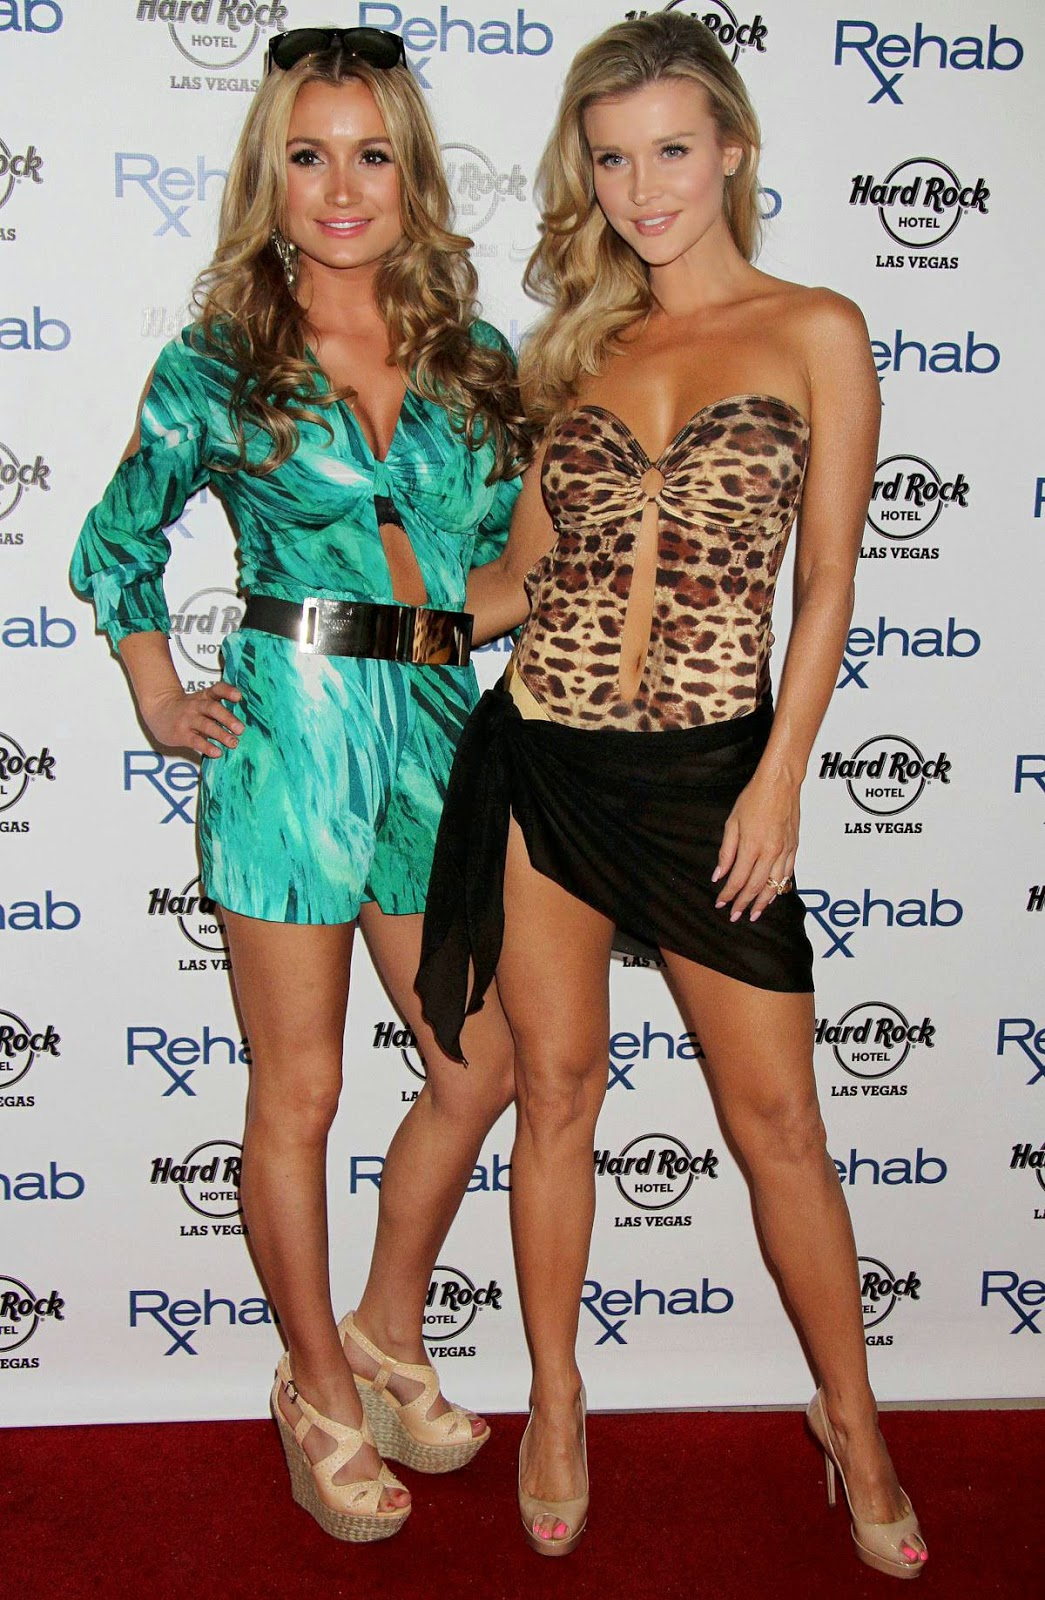 Joanna Krupa - Looking Hot in Bikini Invitational Event Las Vegas